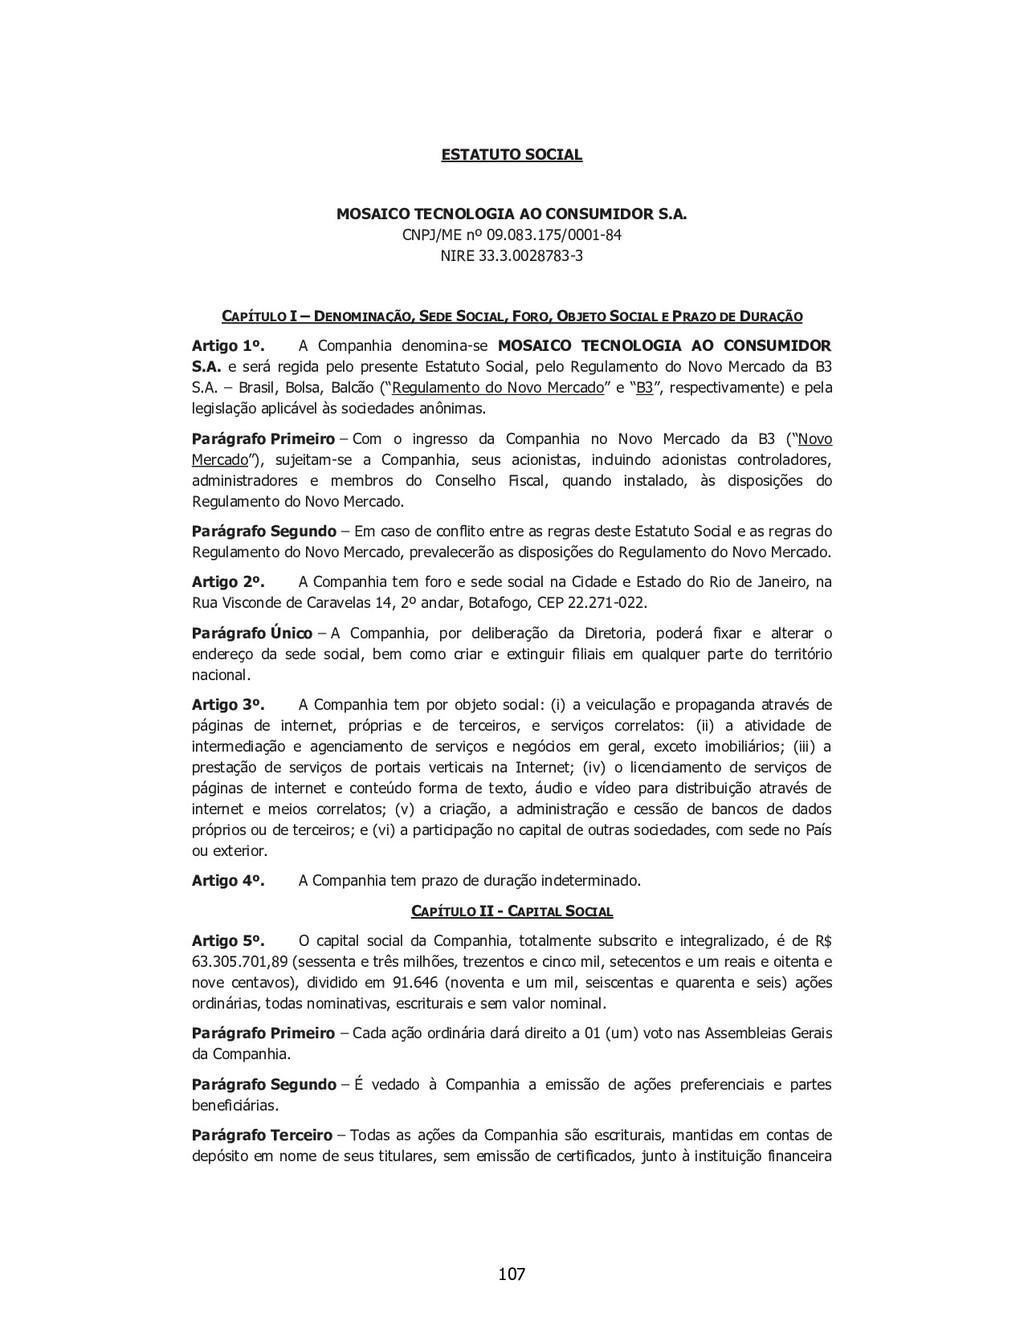 SP - 28538257v1 ESTATUTO SOCIAL MOSAICO TECNOLO...